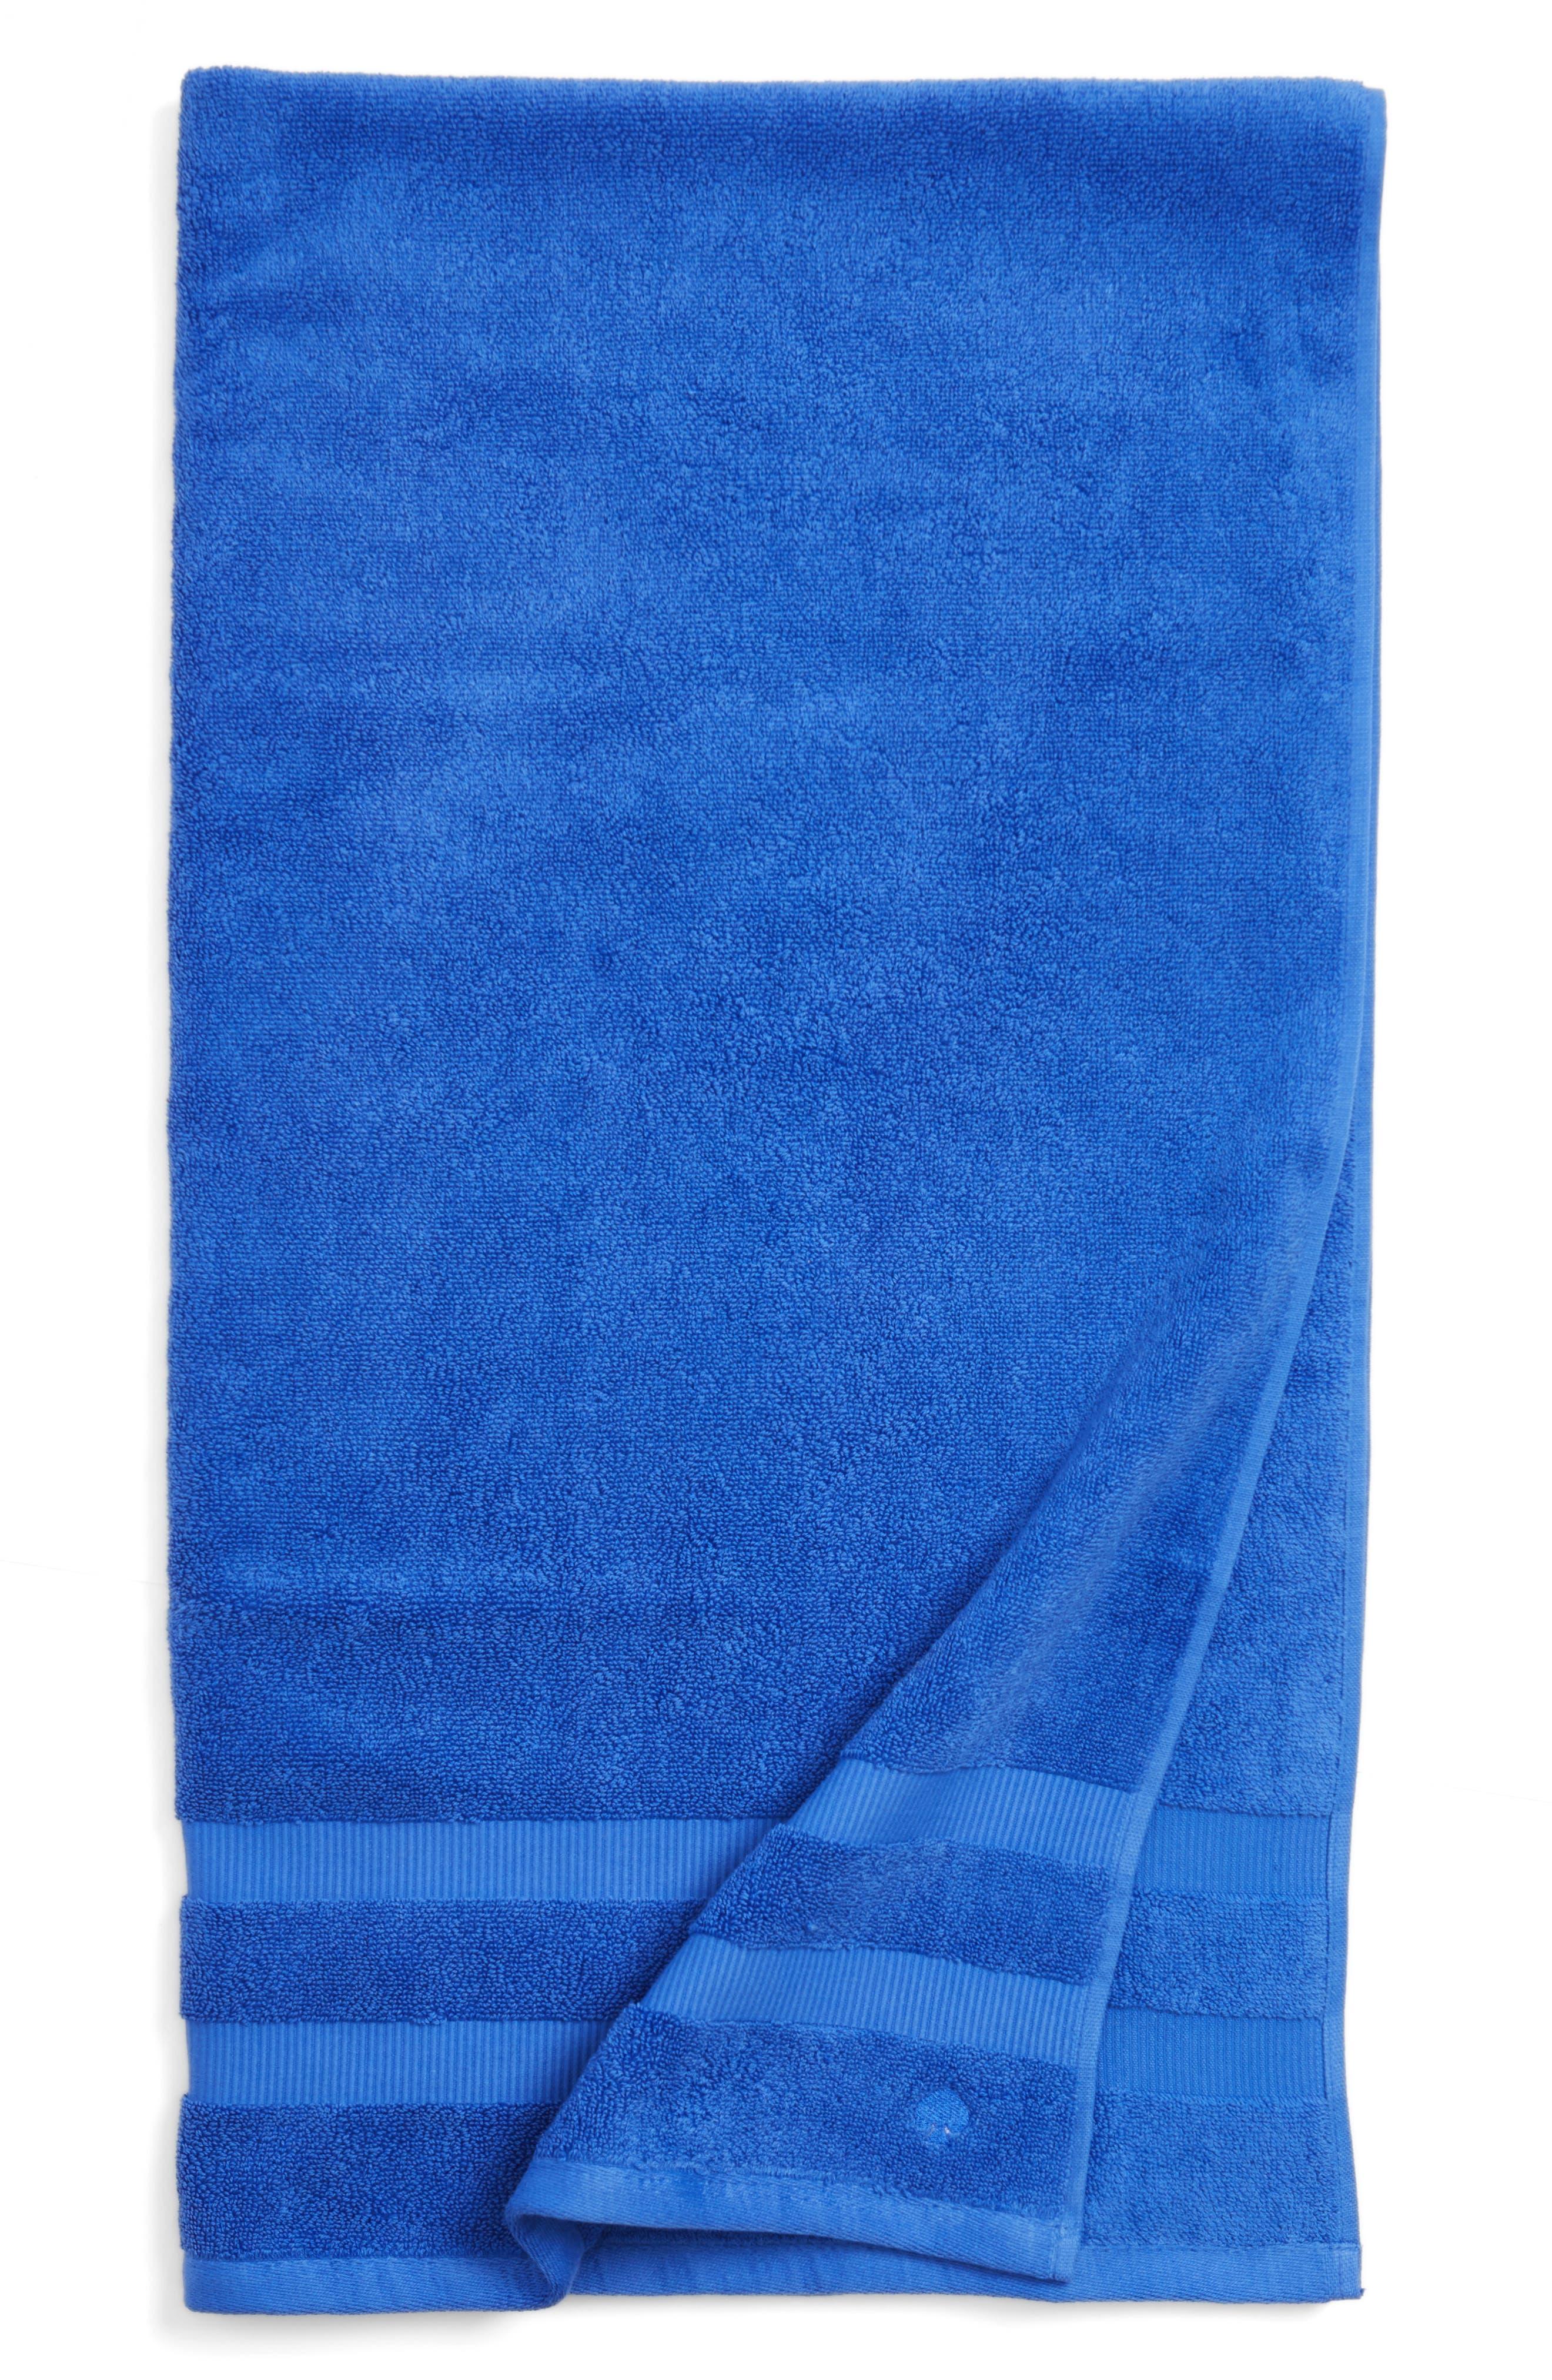 Alternate Image 1 Selected - kate spade new york 'chattam stripe' bath towel